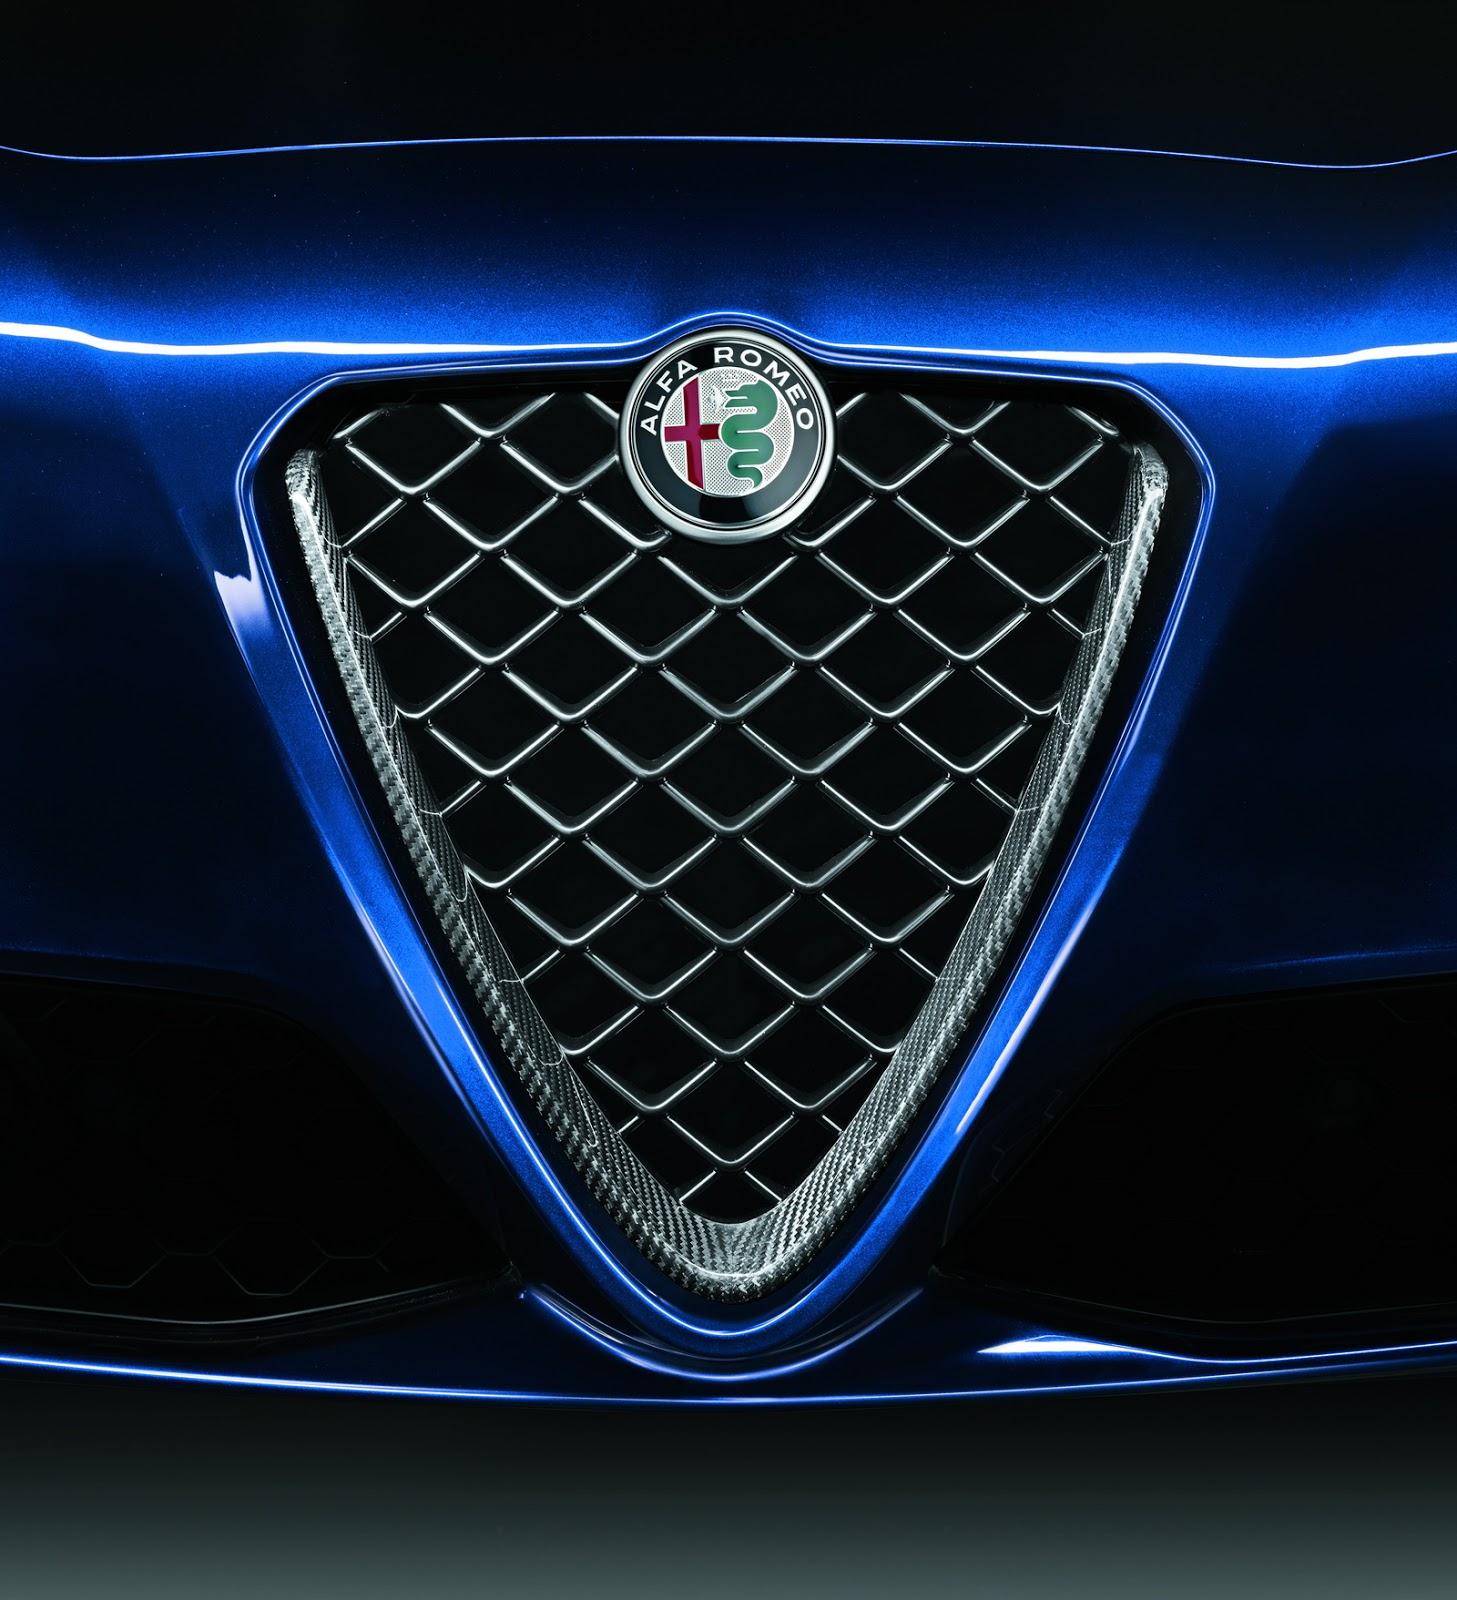 Mopar Accessories Now Available For The Alfa Romeo Giulia